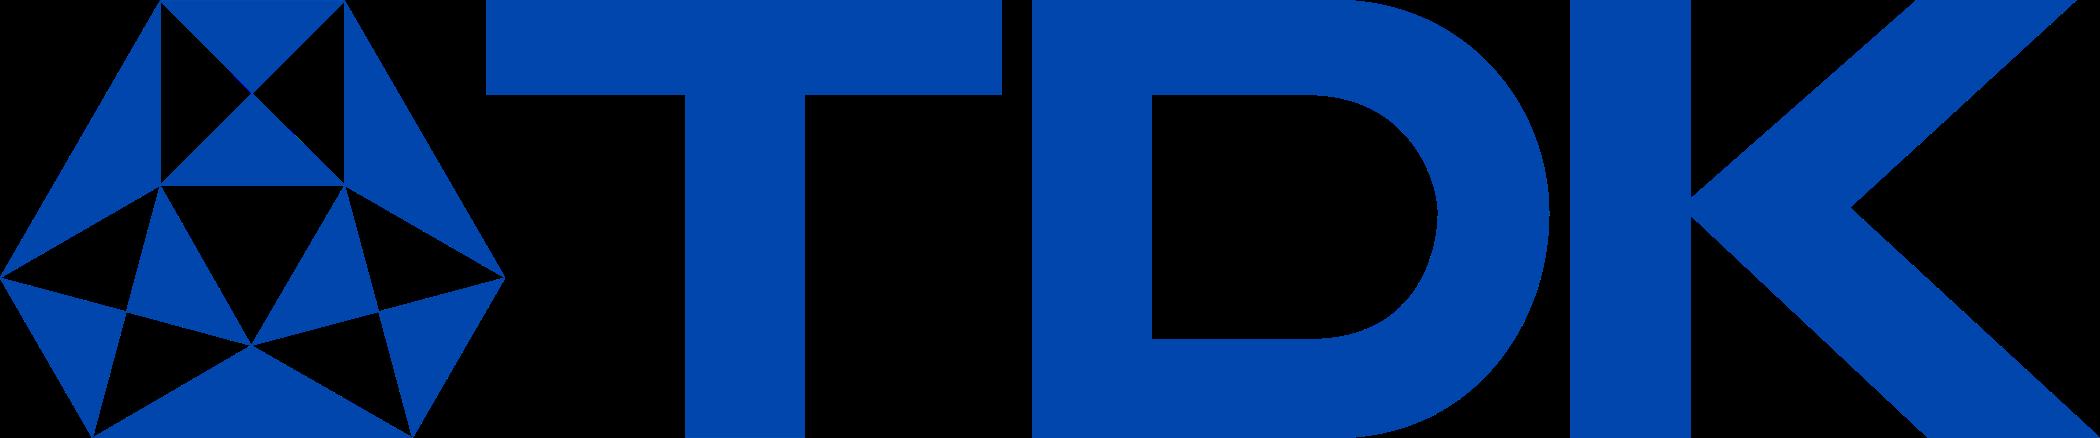 tdk logo 3 - TDK Logo